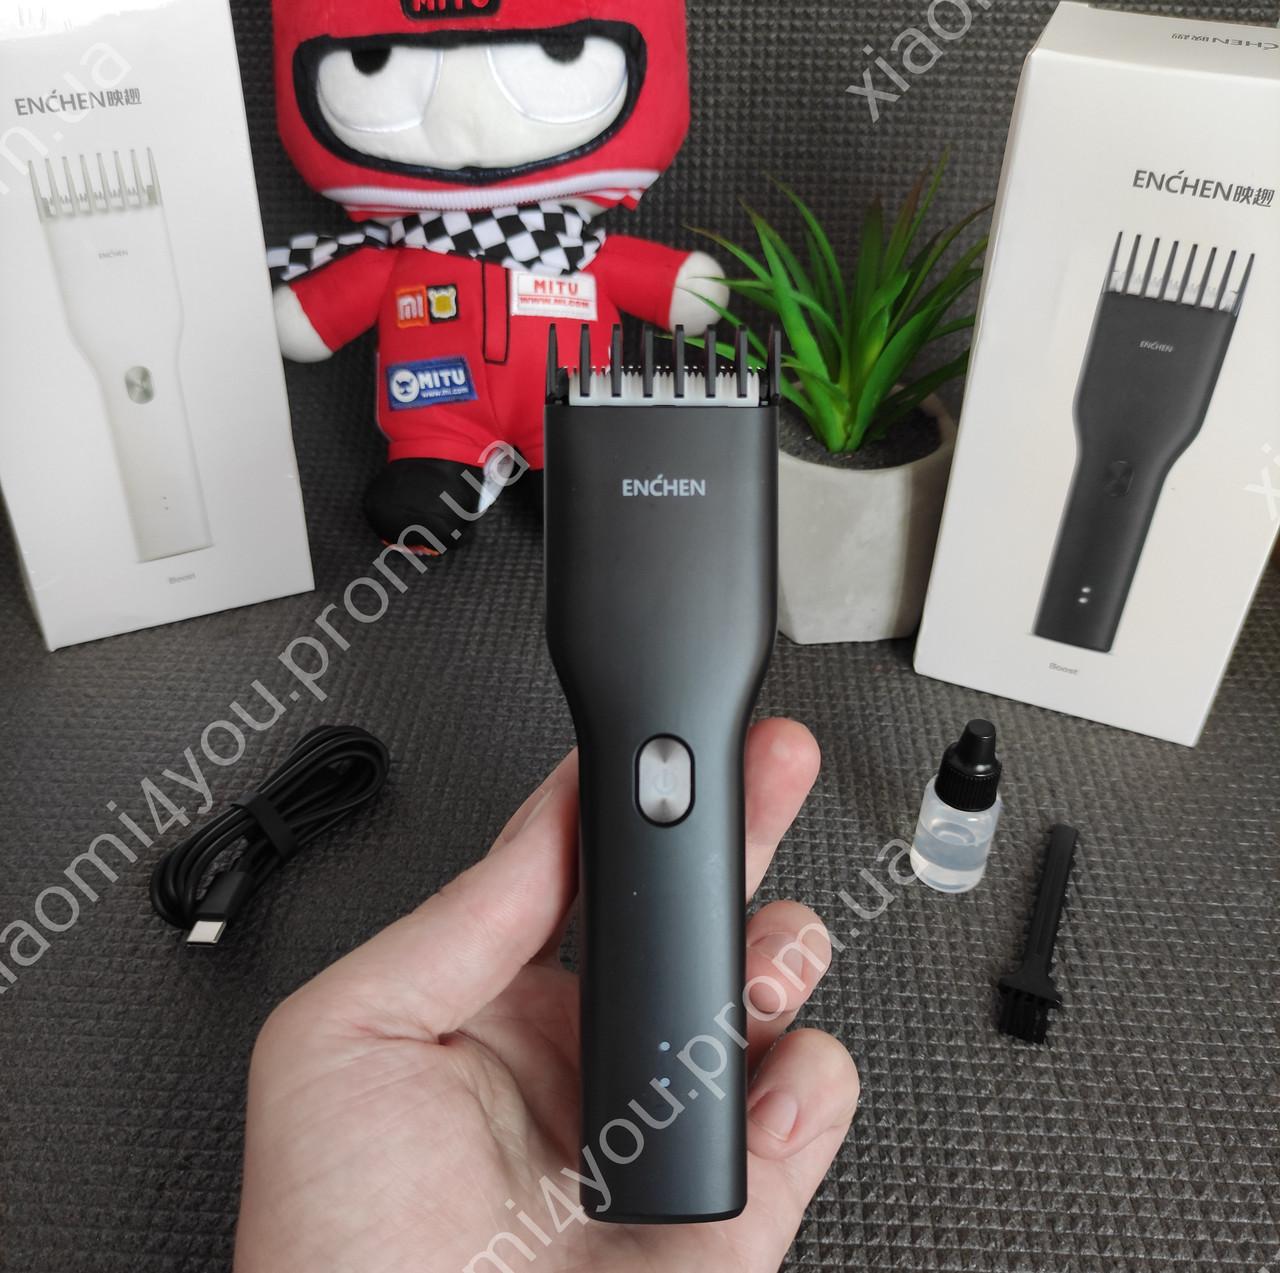 Xiaomi Mi Enchen Boost USB Триммер машинка для стрижки волос